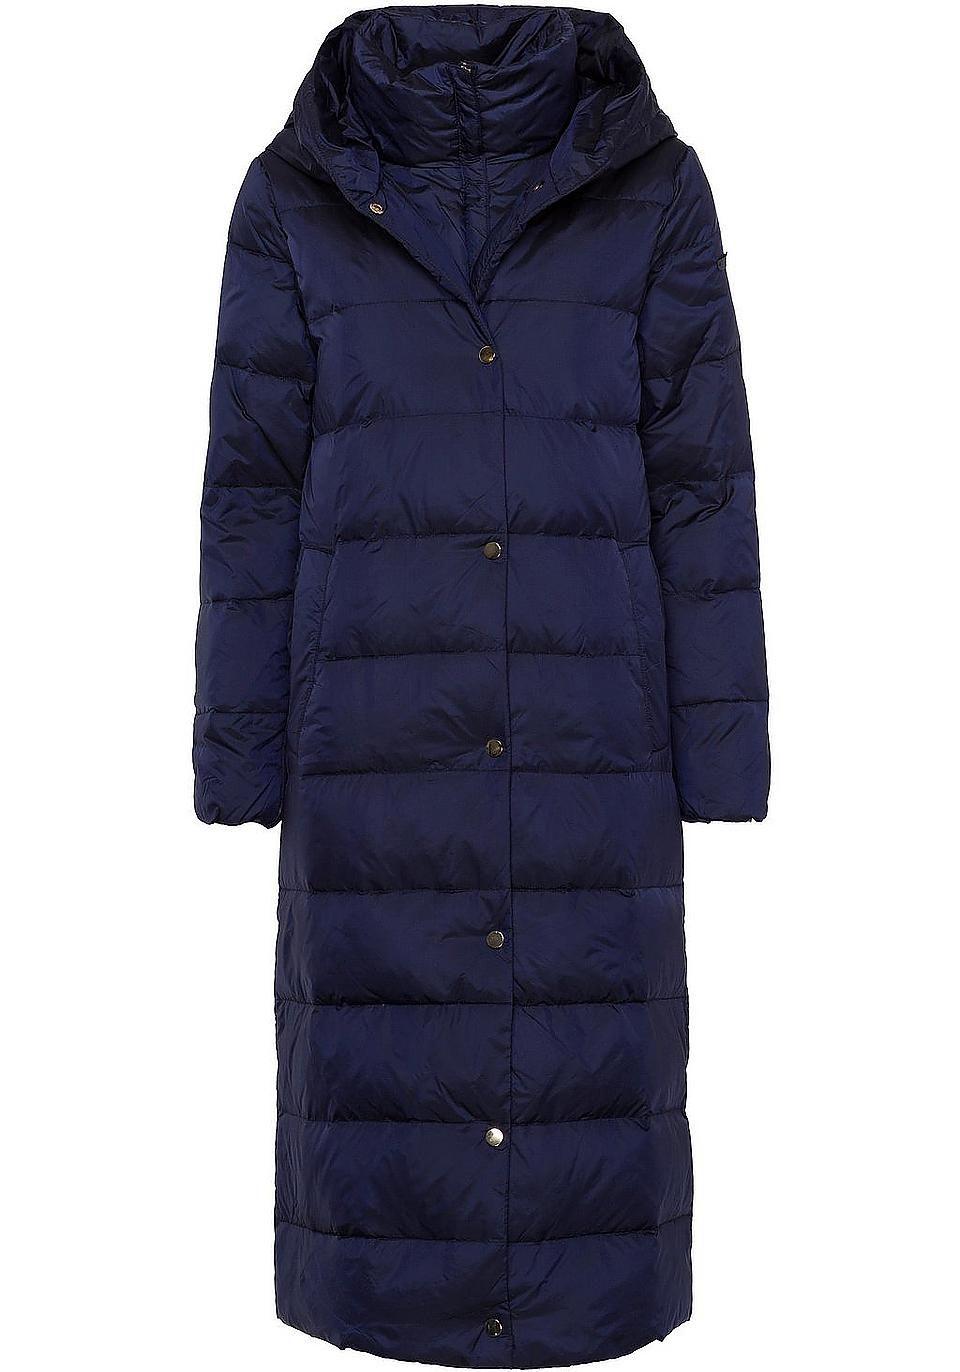 Esprit Collection Langmantel #steppjacke #winterjacke